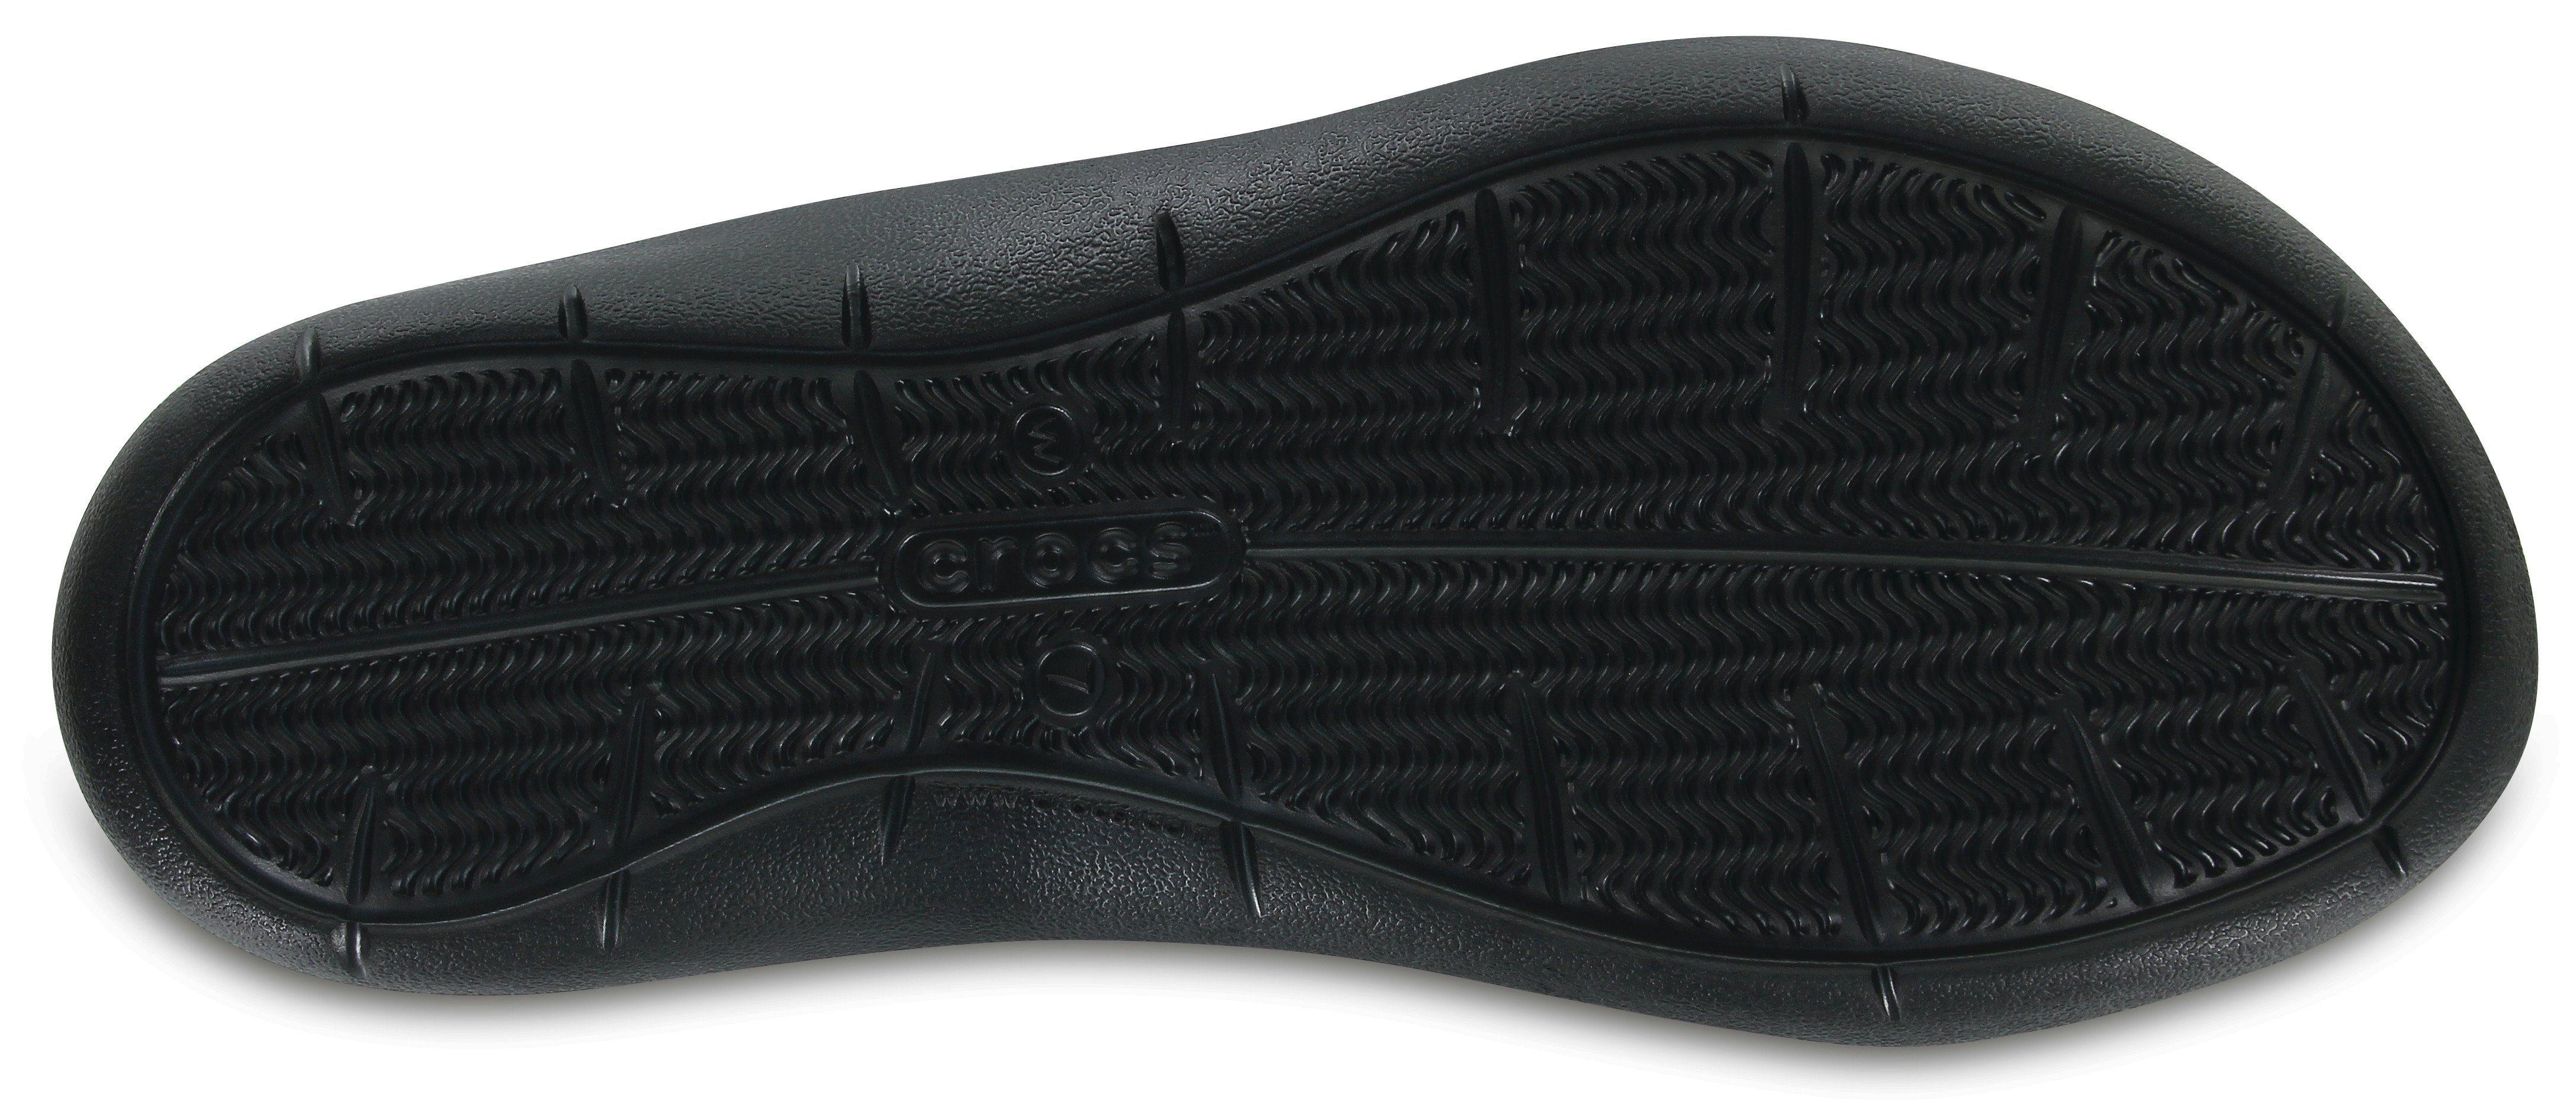 Crocs Swiftwater Sandal Pantolette  online kaufen  Pantolette schwarz be576f